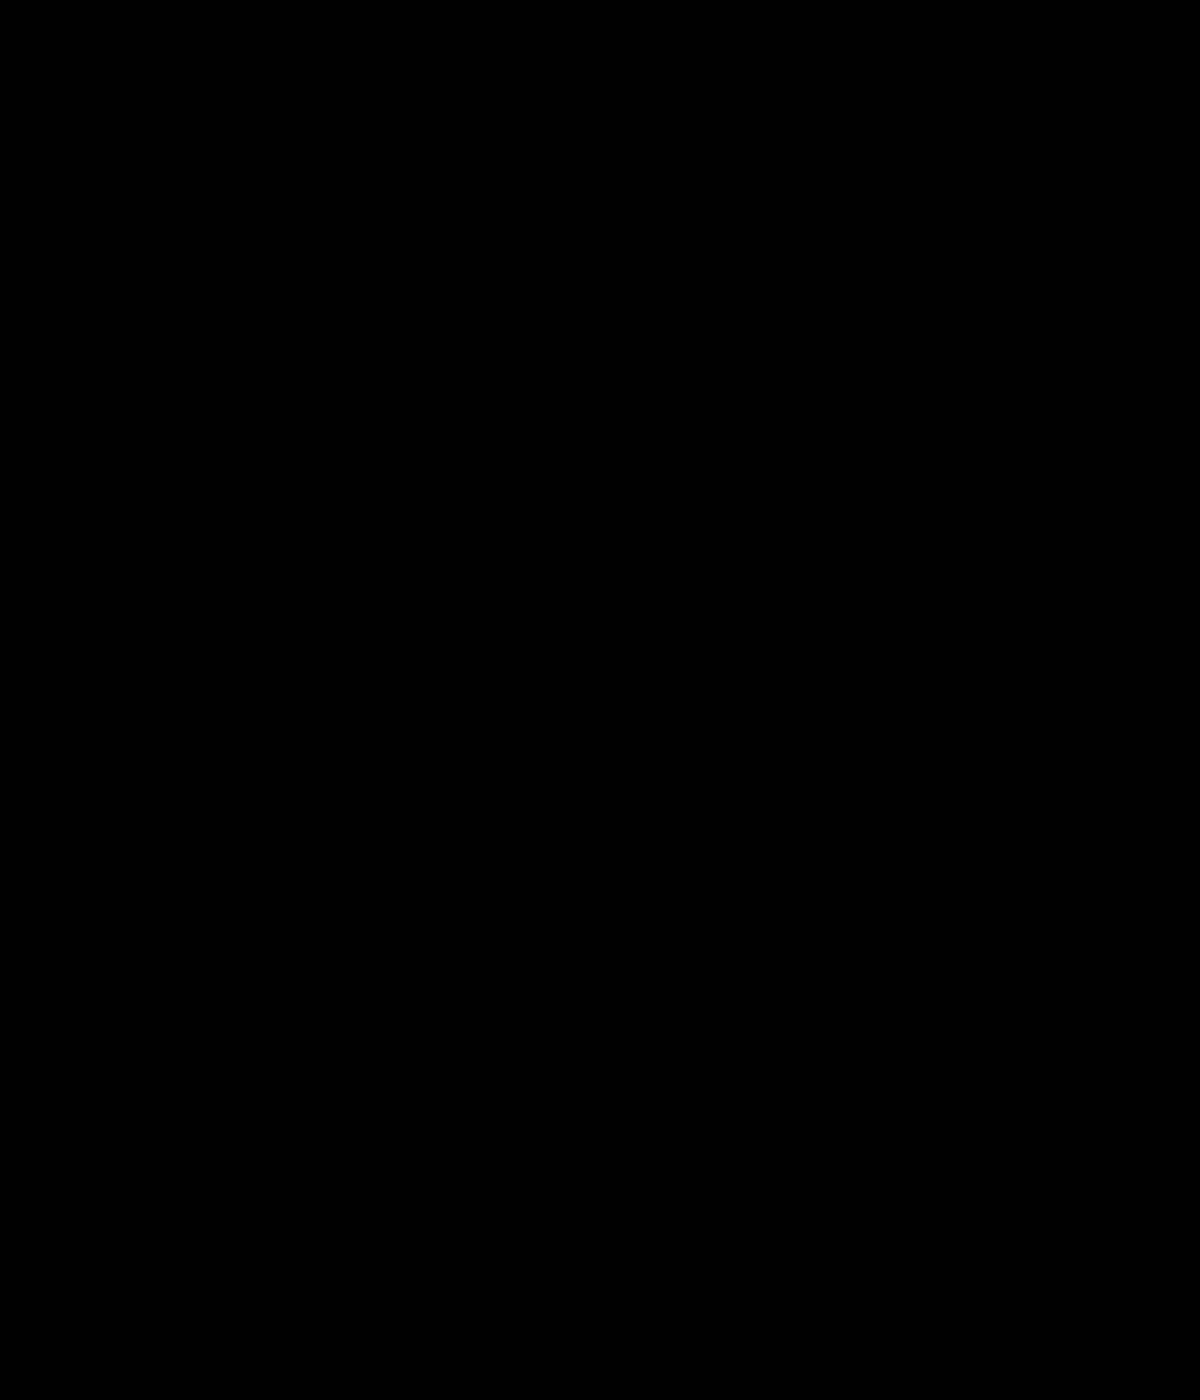 Yandere simulator (Base)